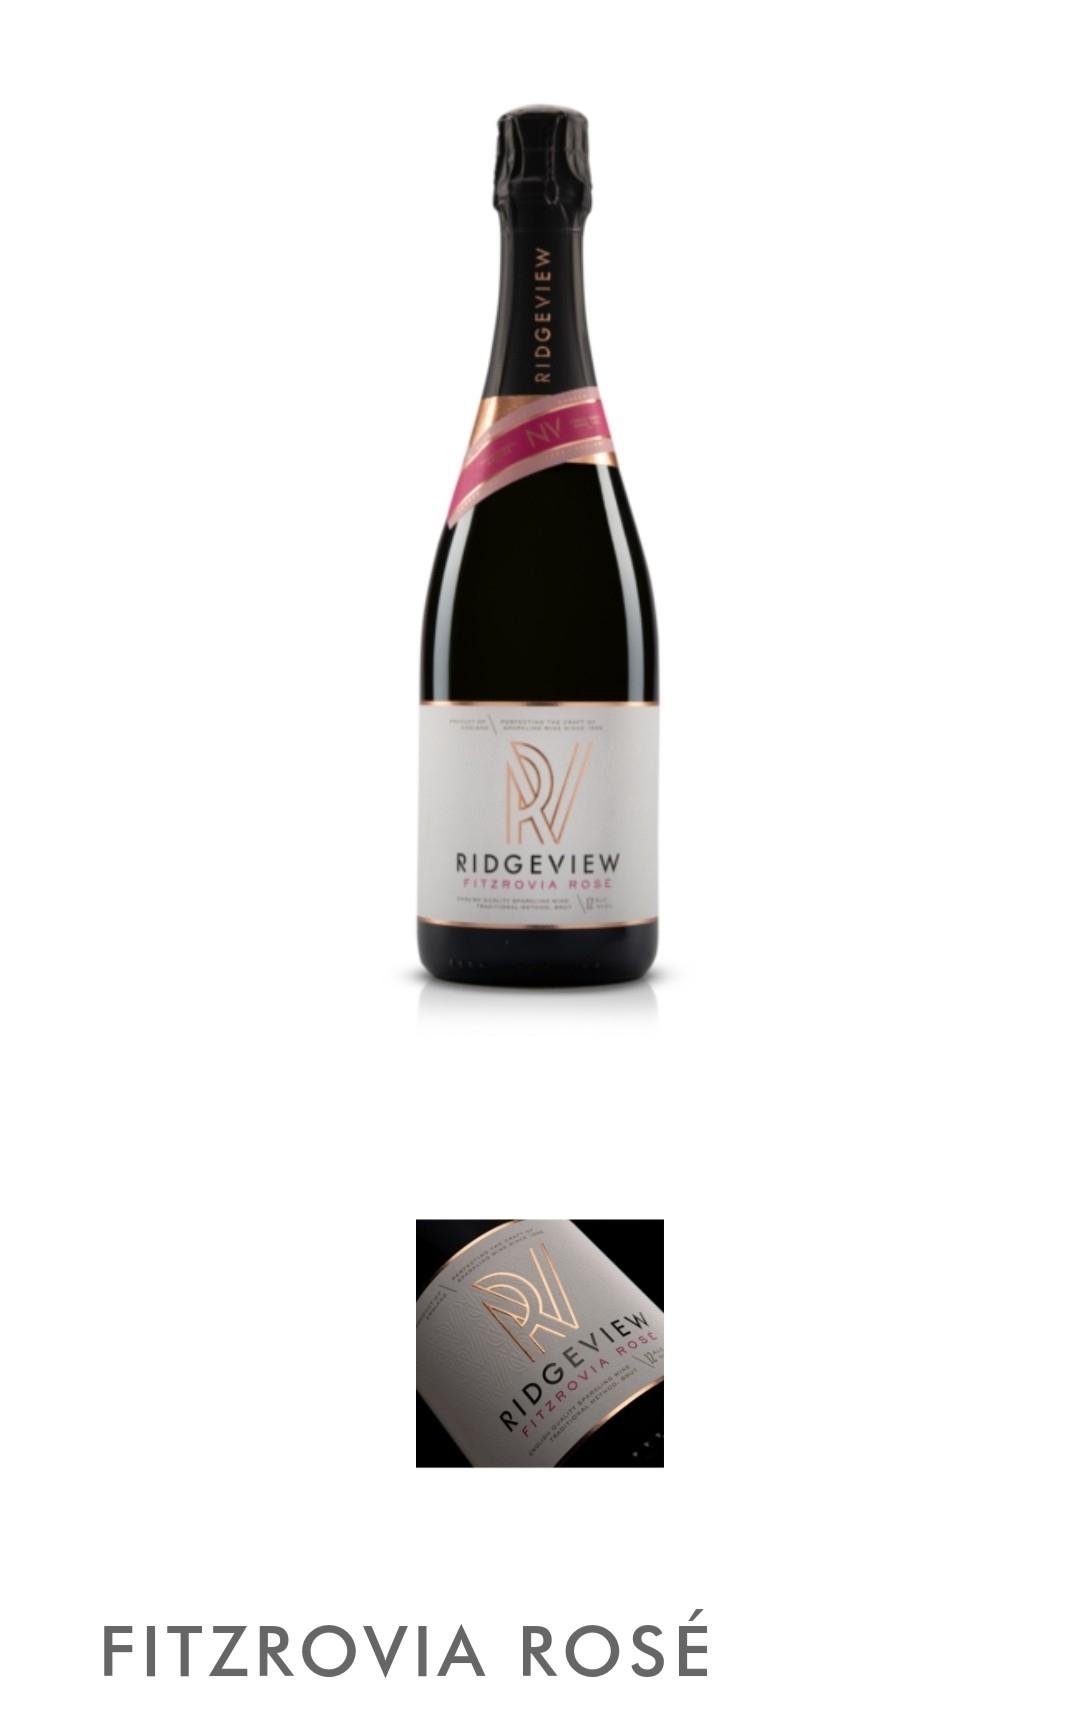 Ridgeview - Fitzrovia Rosé wine